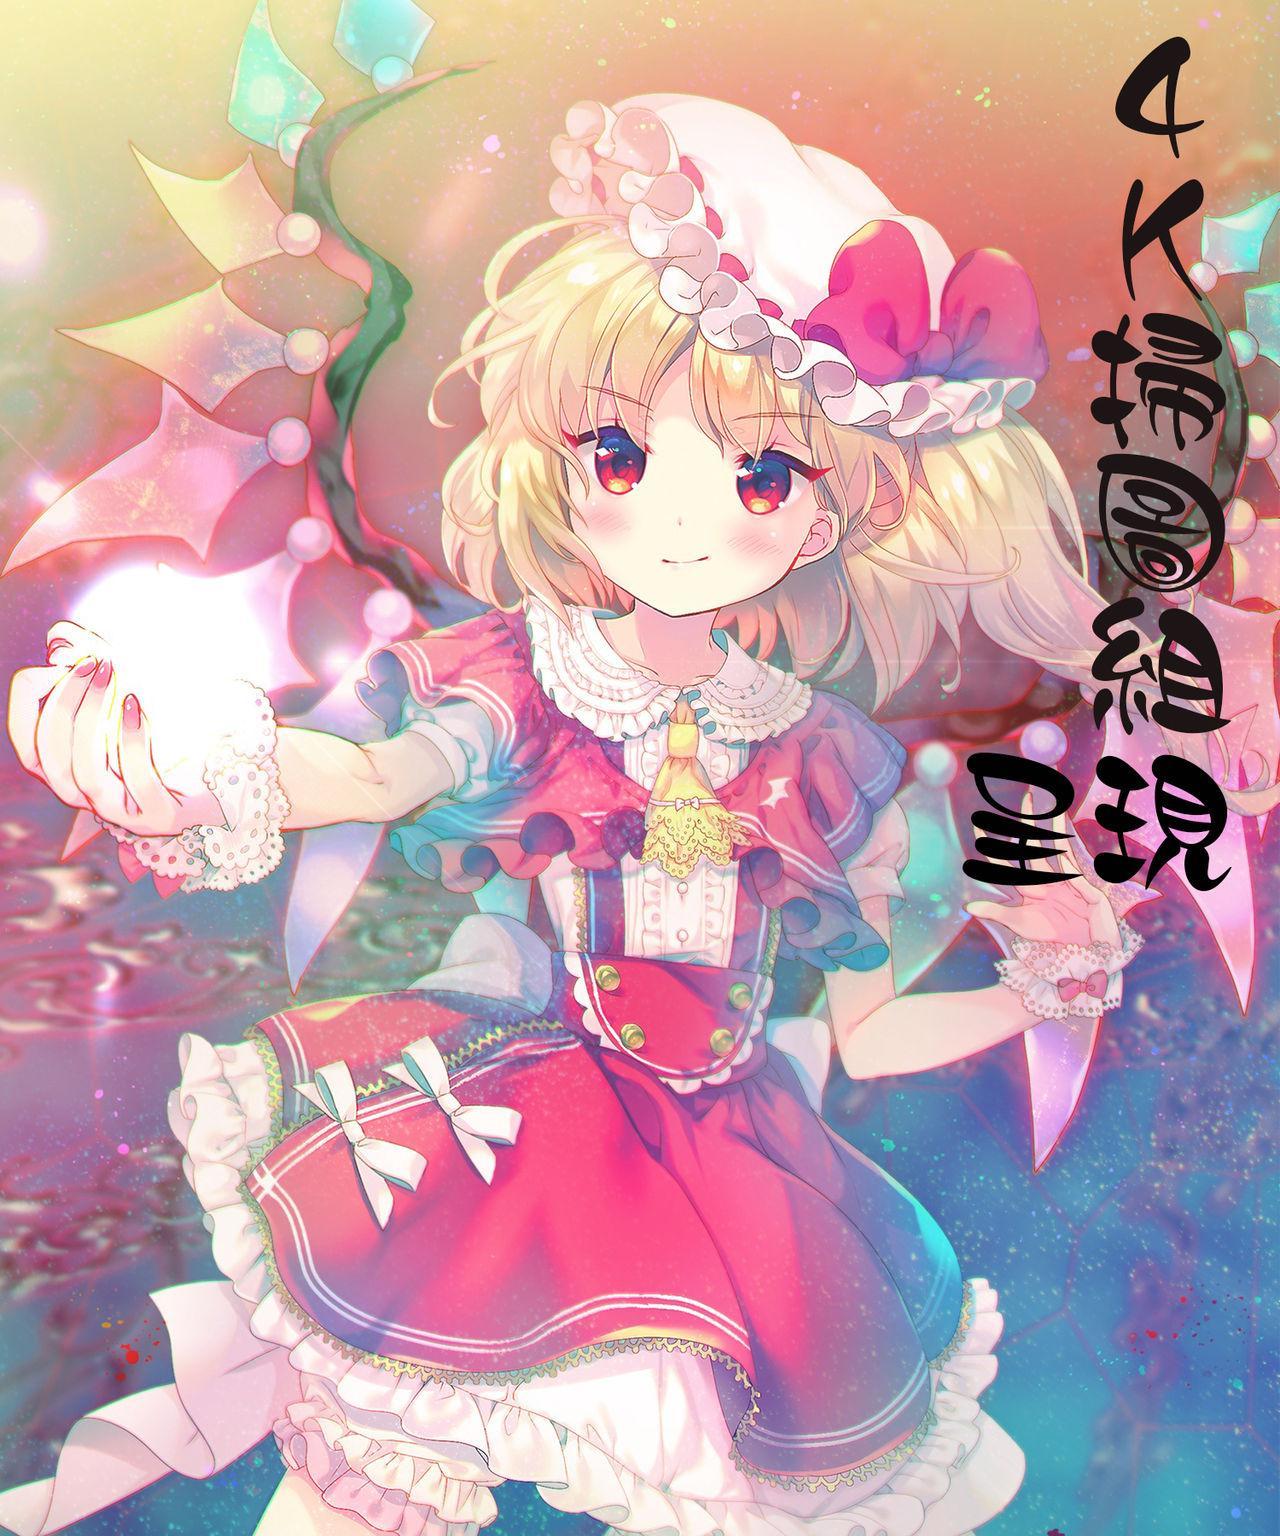 [Mario] Ona Hime-sama - Onanie-holic Princess [Chinese] 2